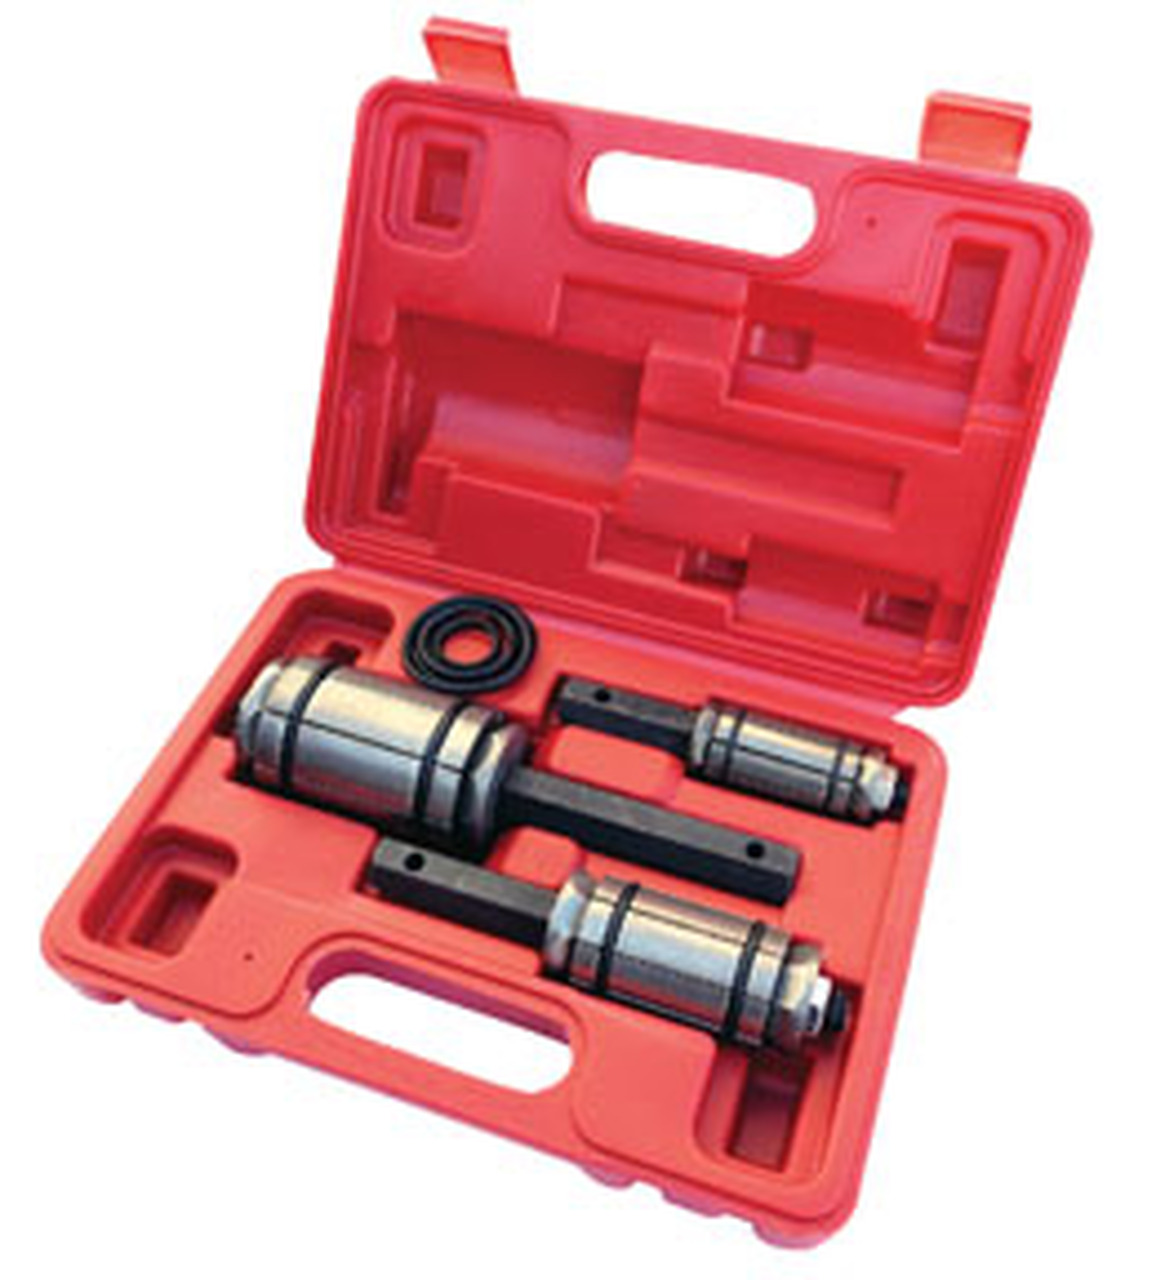 tailpipe expander set